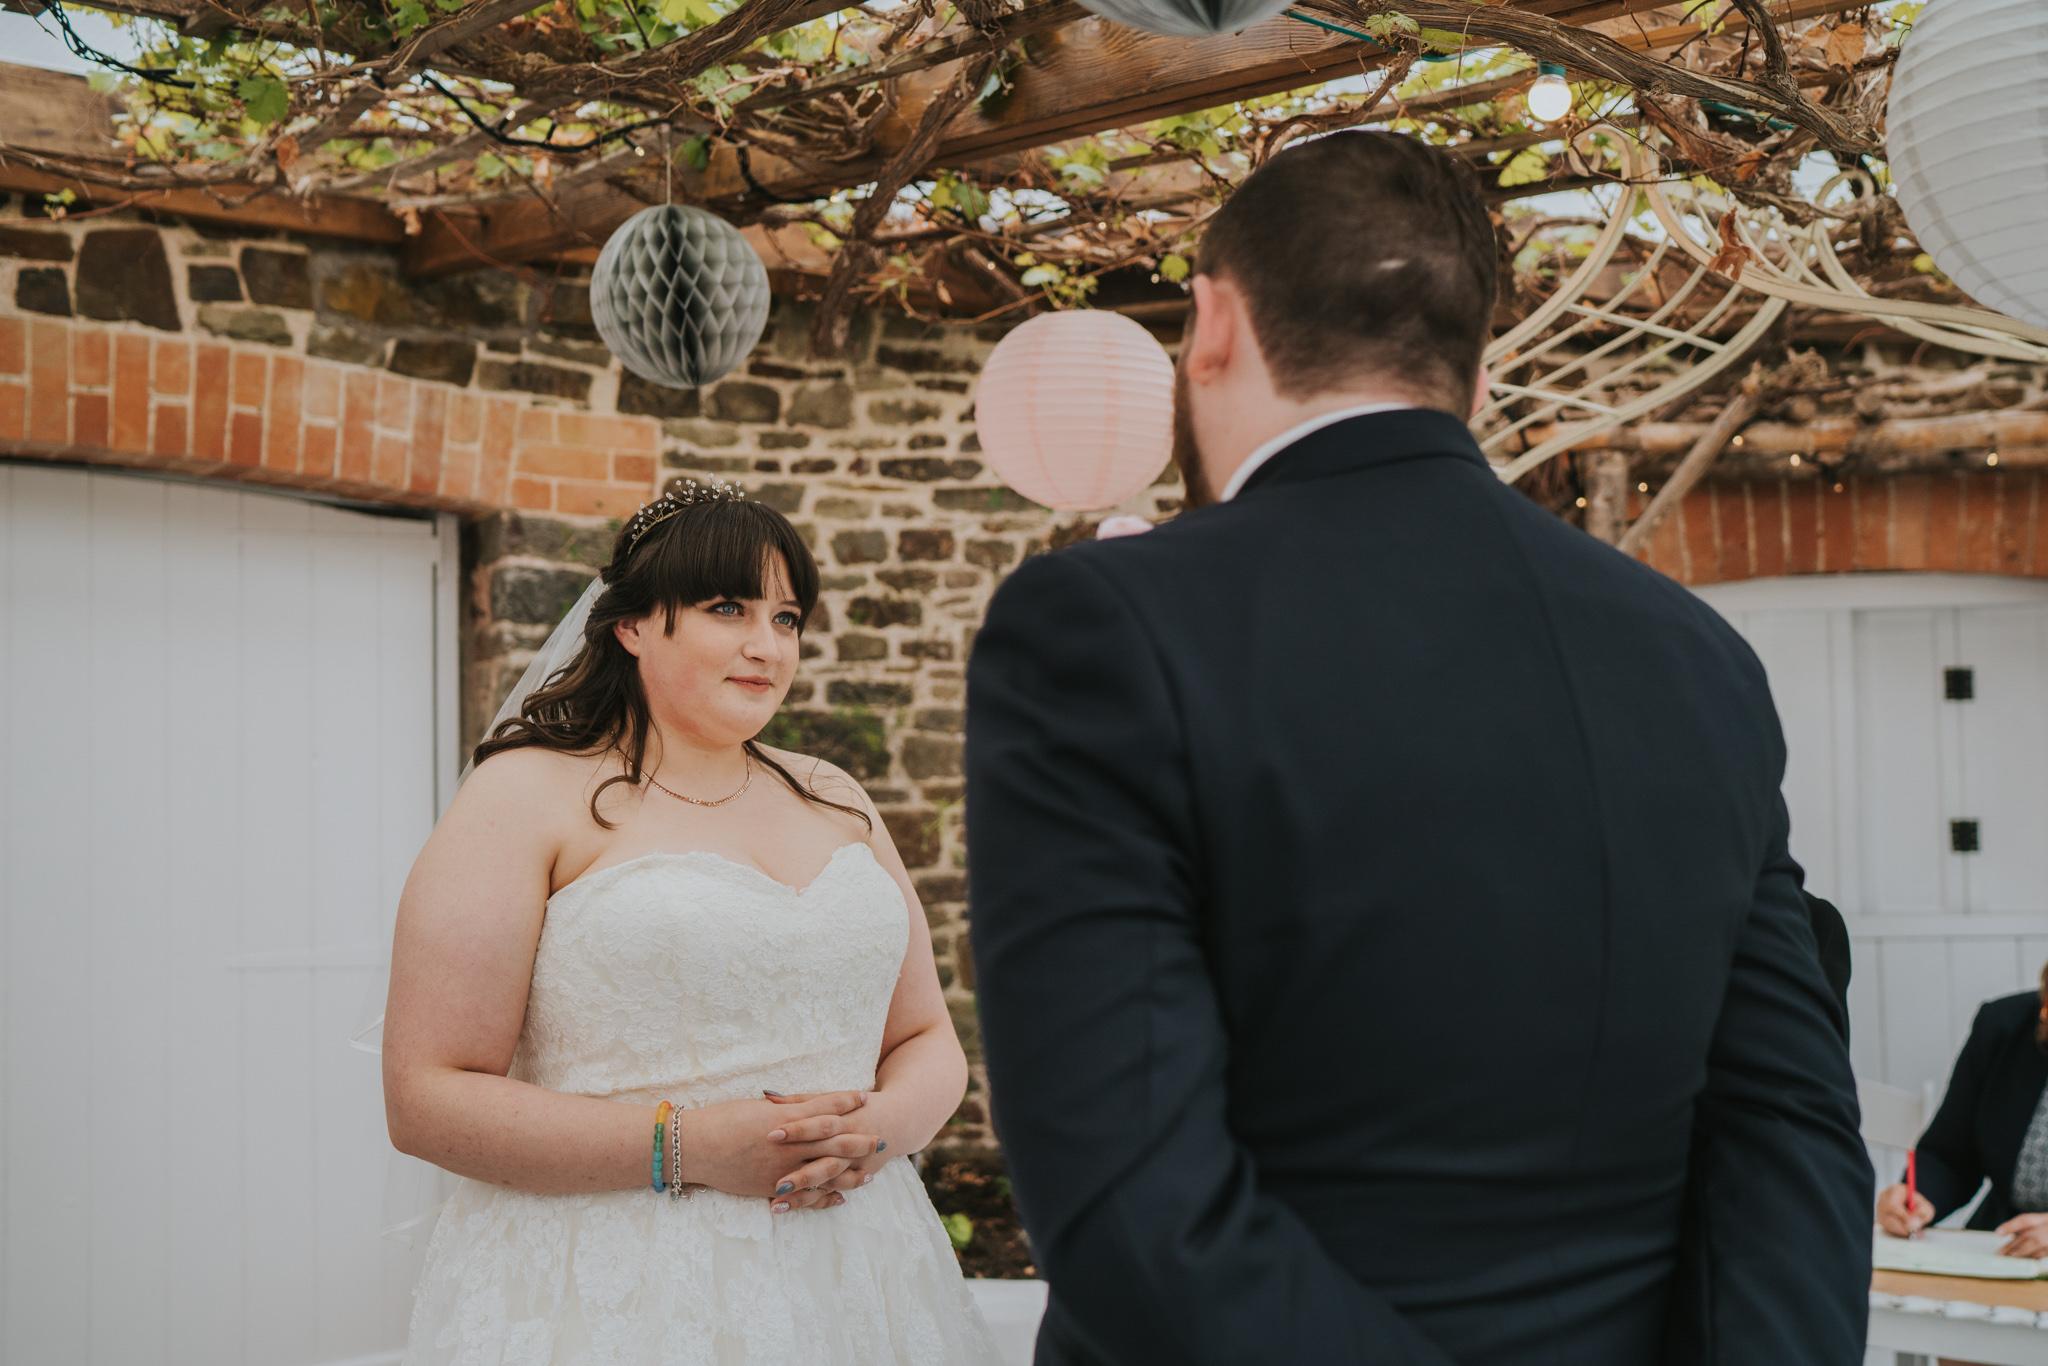 grace-sam-old-barn-clovelly-devon-wedding-photographer-grace-elizabeth-essex-suffolk-norfolk-wedding-photographer (53 of 132).jpg